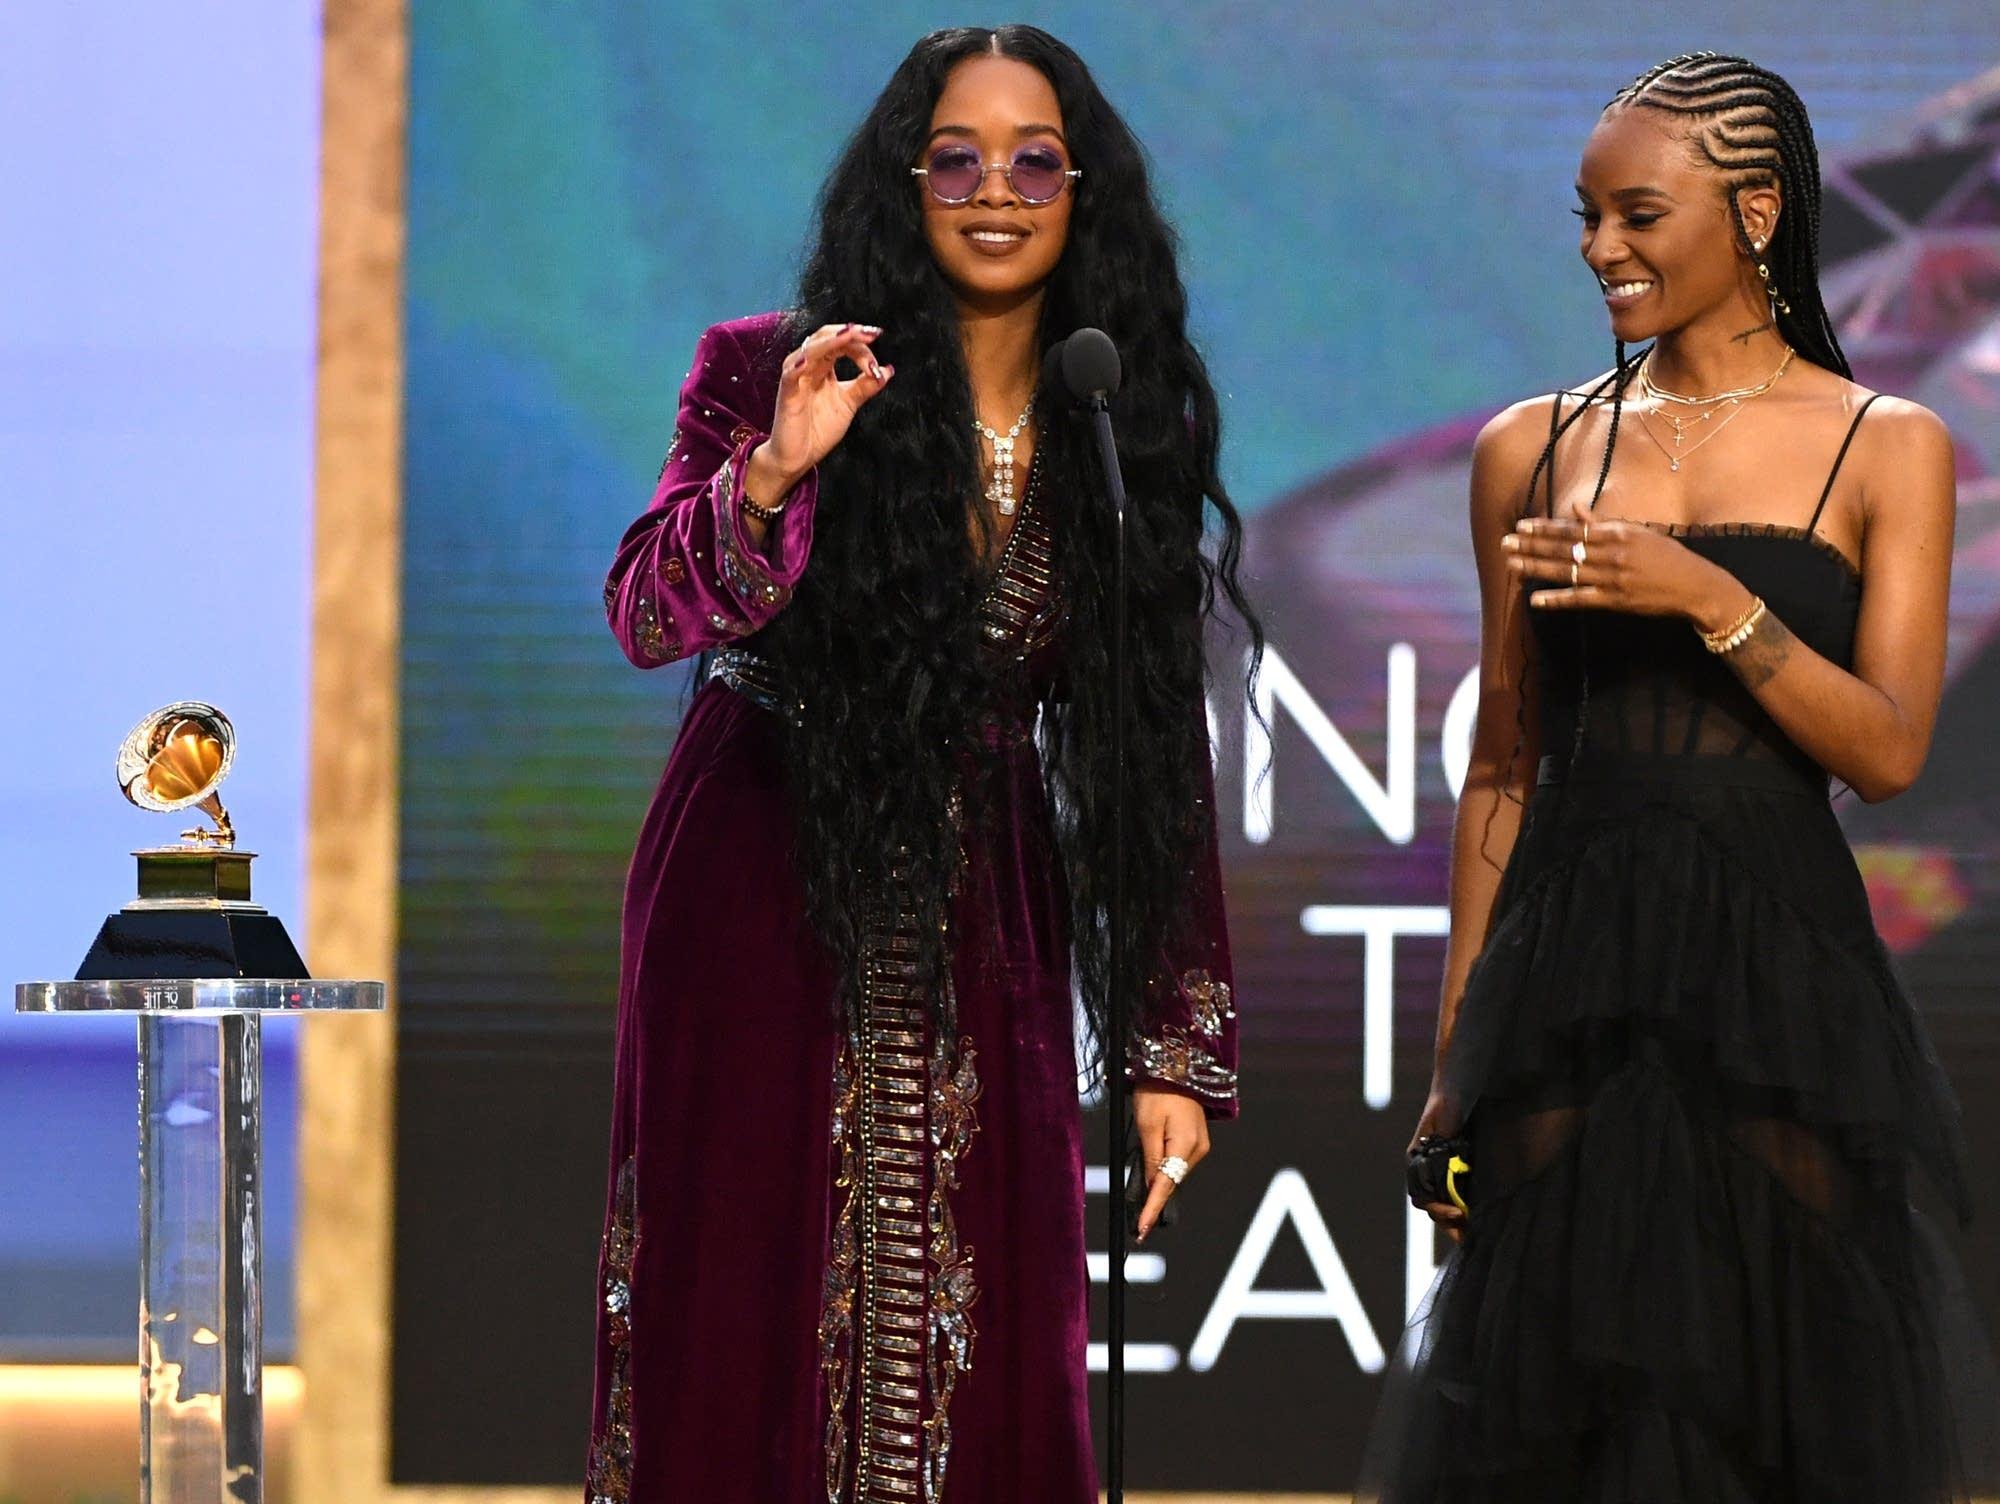 H.E.R. and Tiara Thomas accepting Grammys.